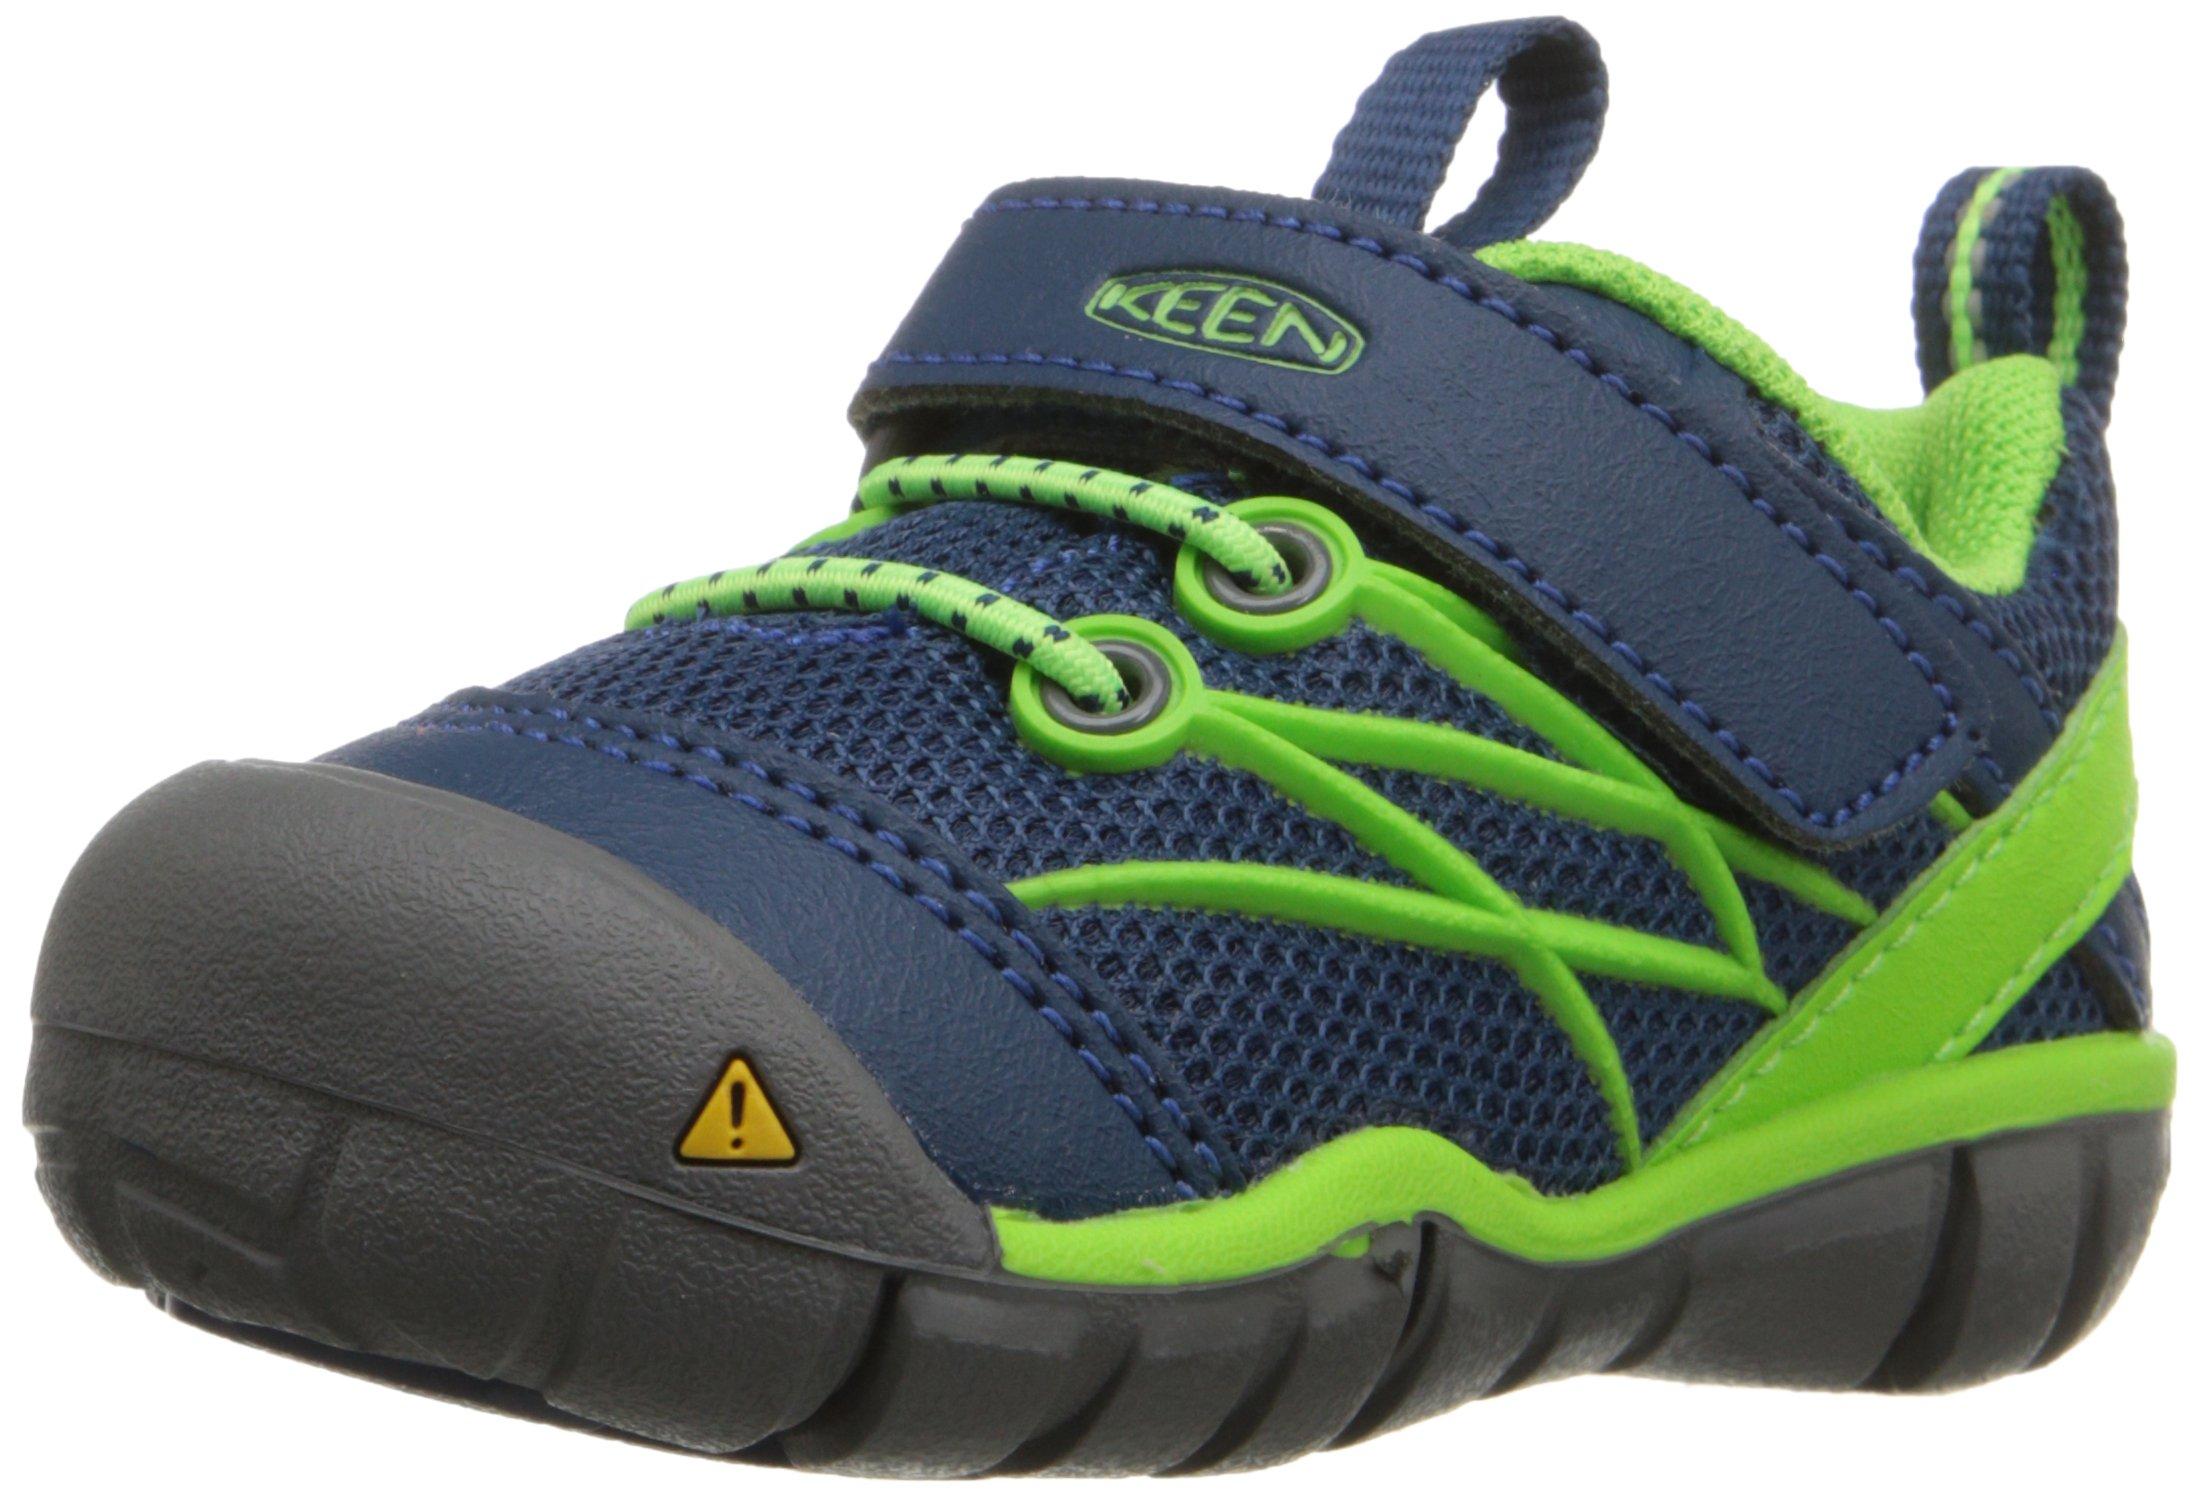 KEEN Chandler CNX Shoe (Toddler/Little Kid), Poseidon/Jasmine Green, 11 M US Little Kid